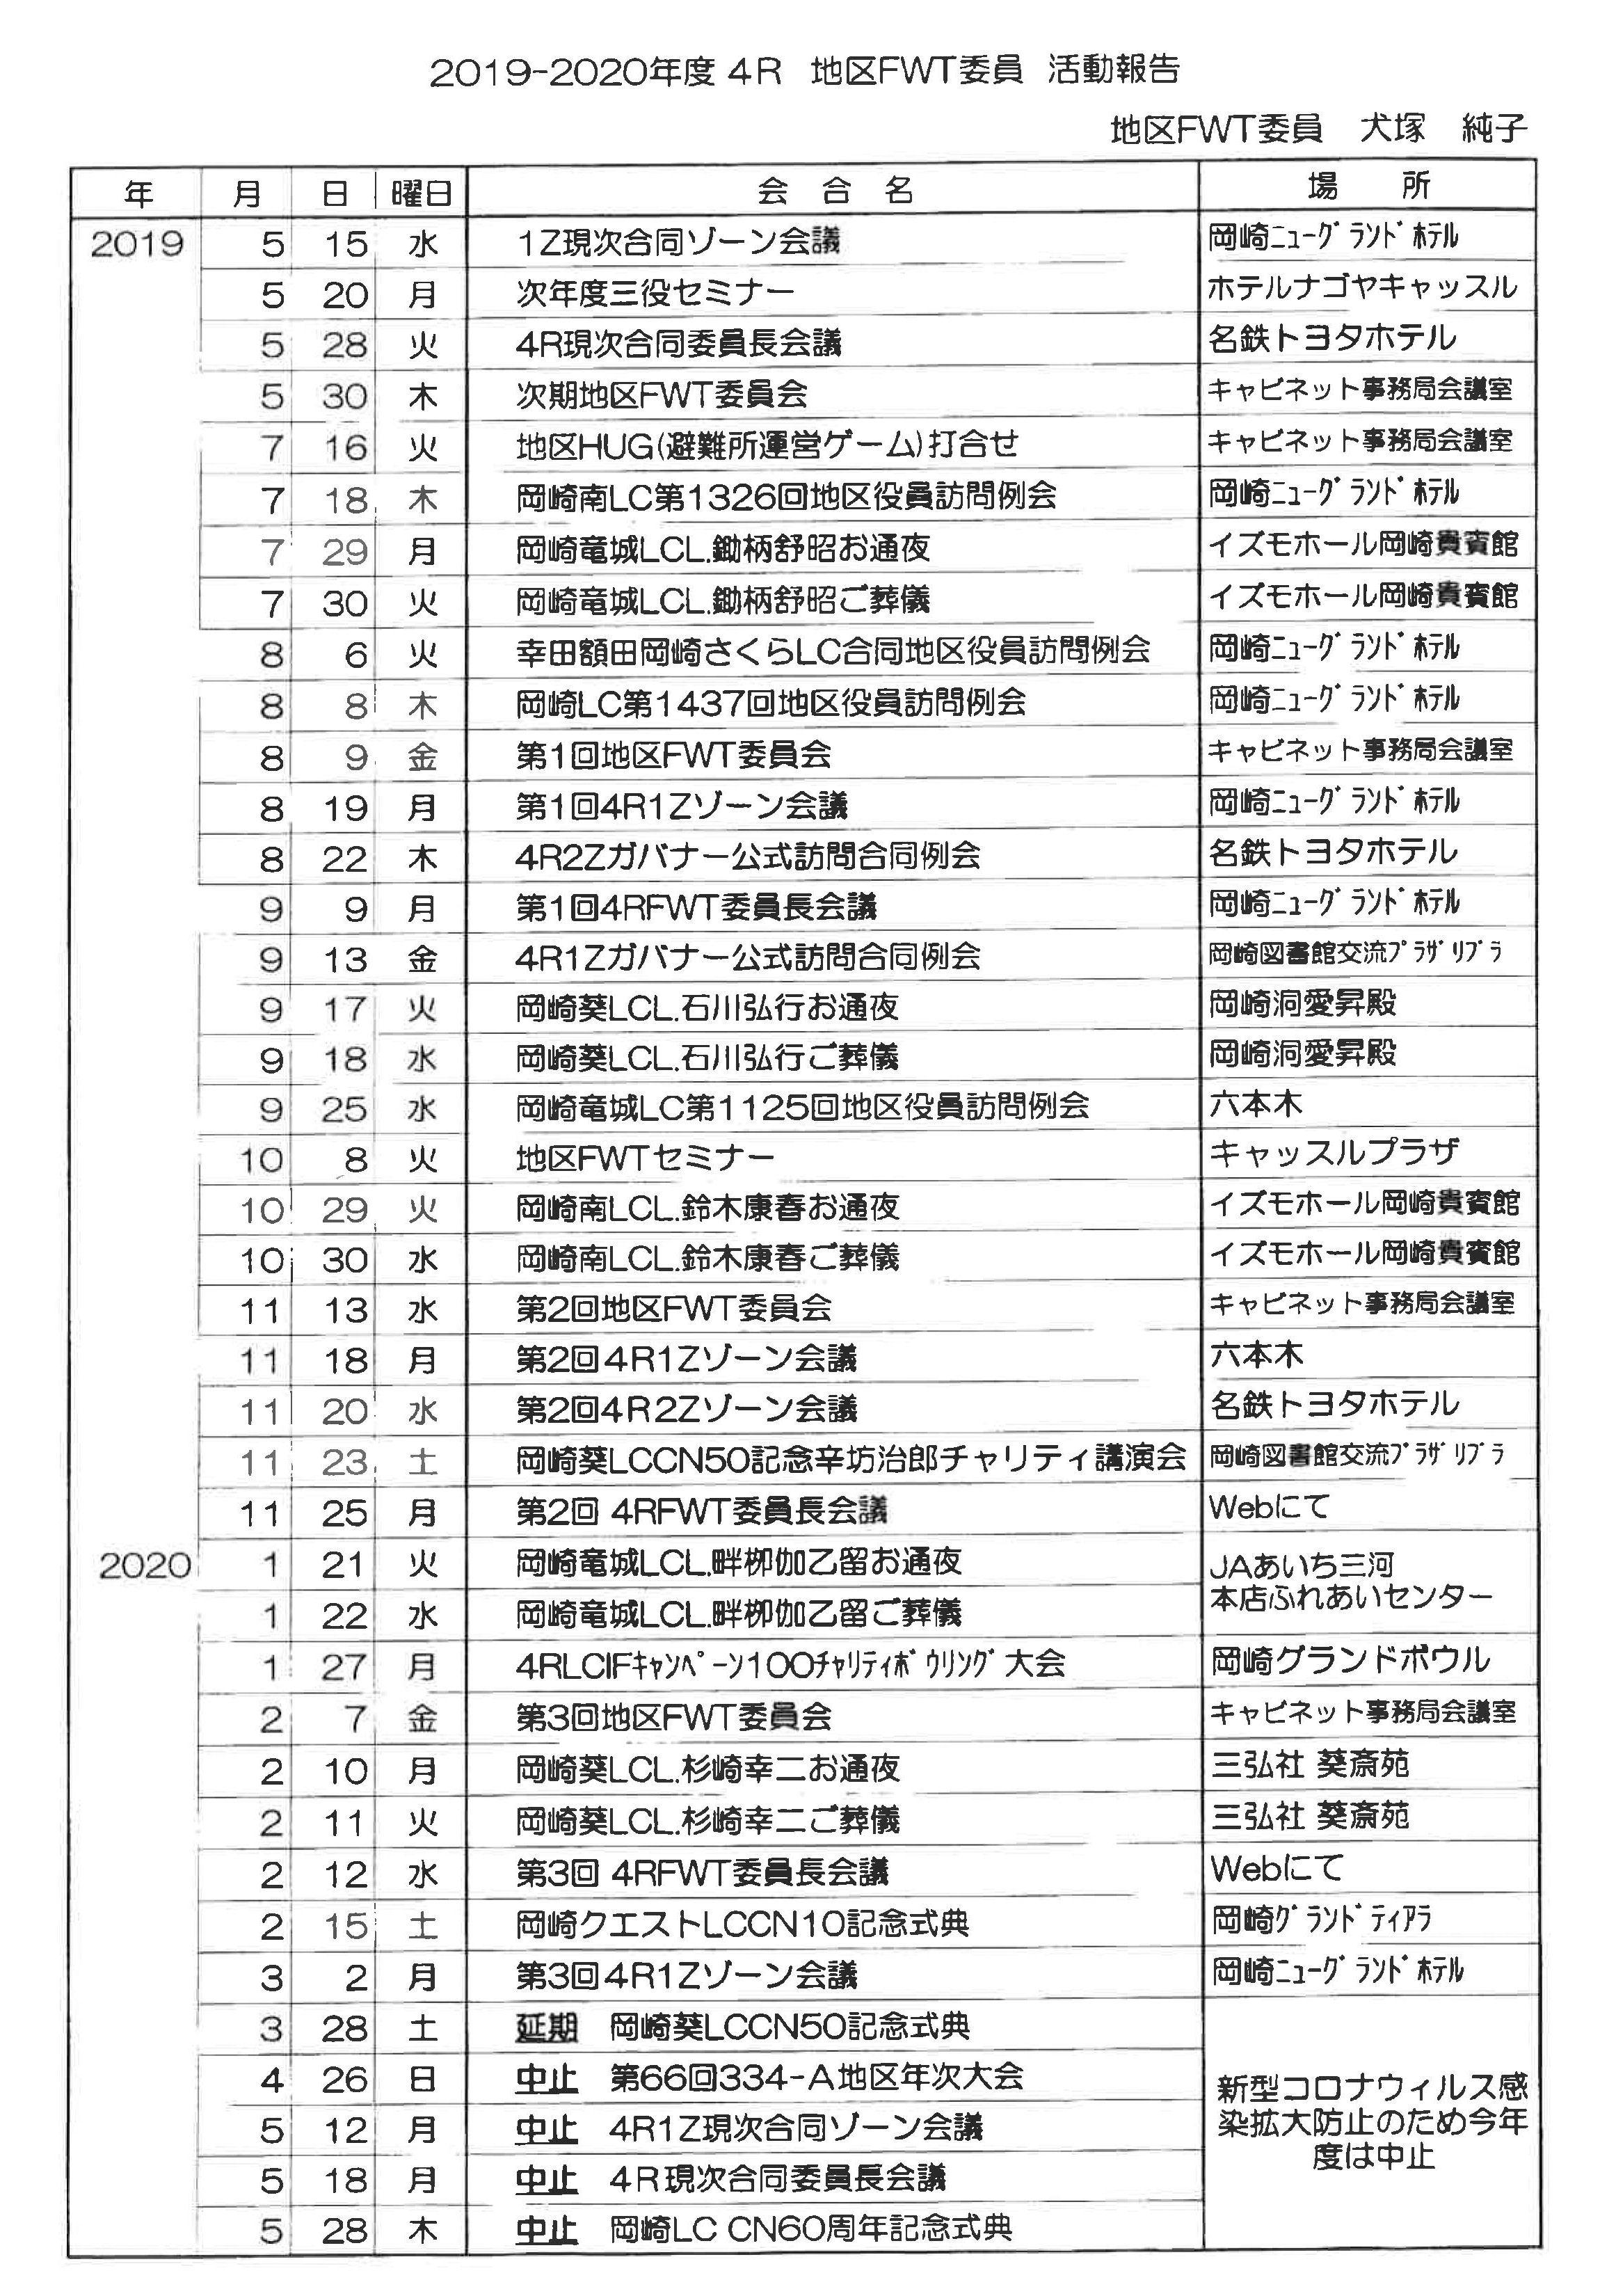 32 4R FWT委員活動報告